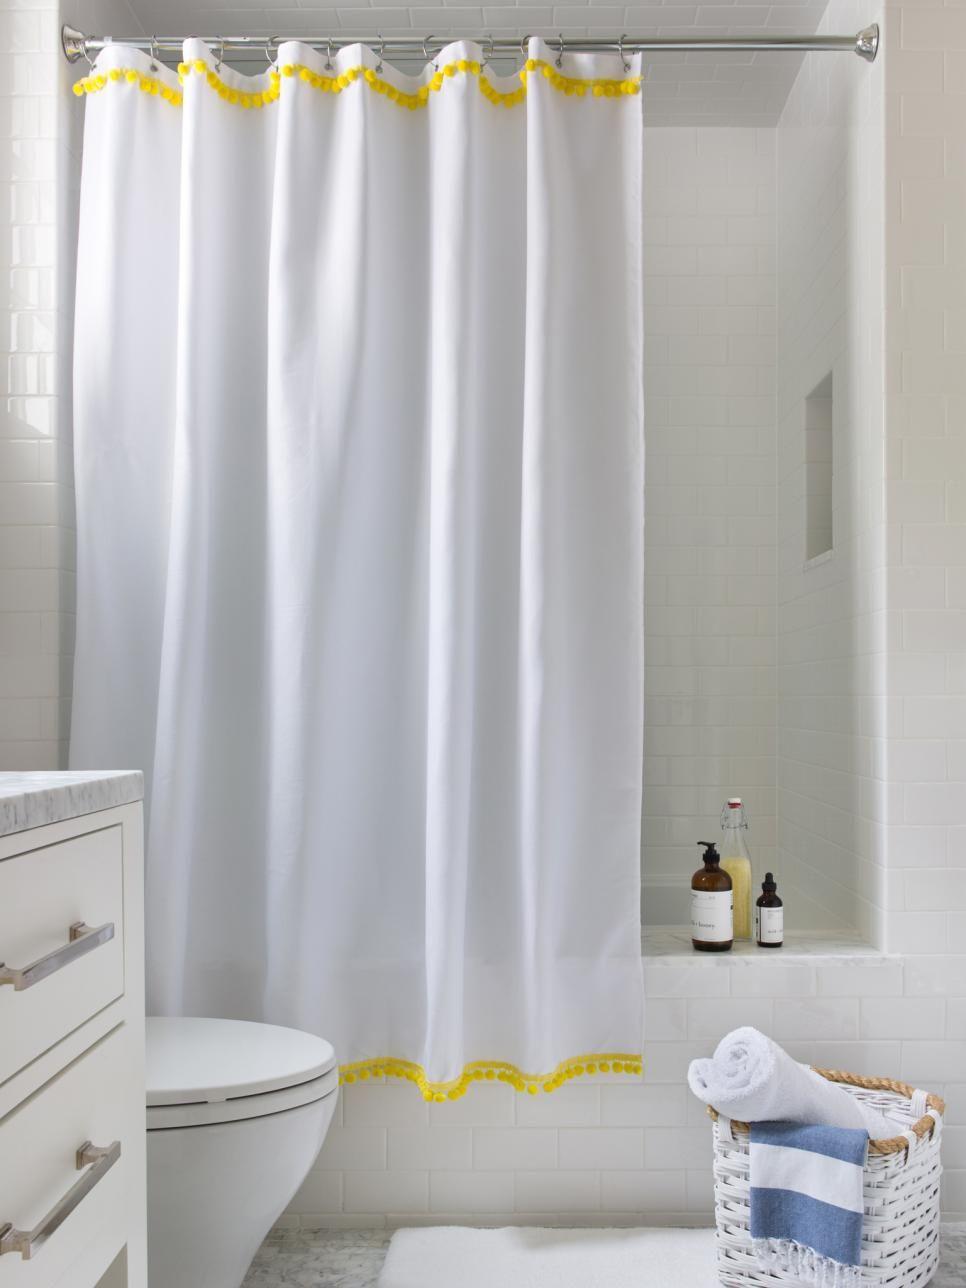 Best Inpirational Shower Curtain #Bathroom #Shower+Curtain